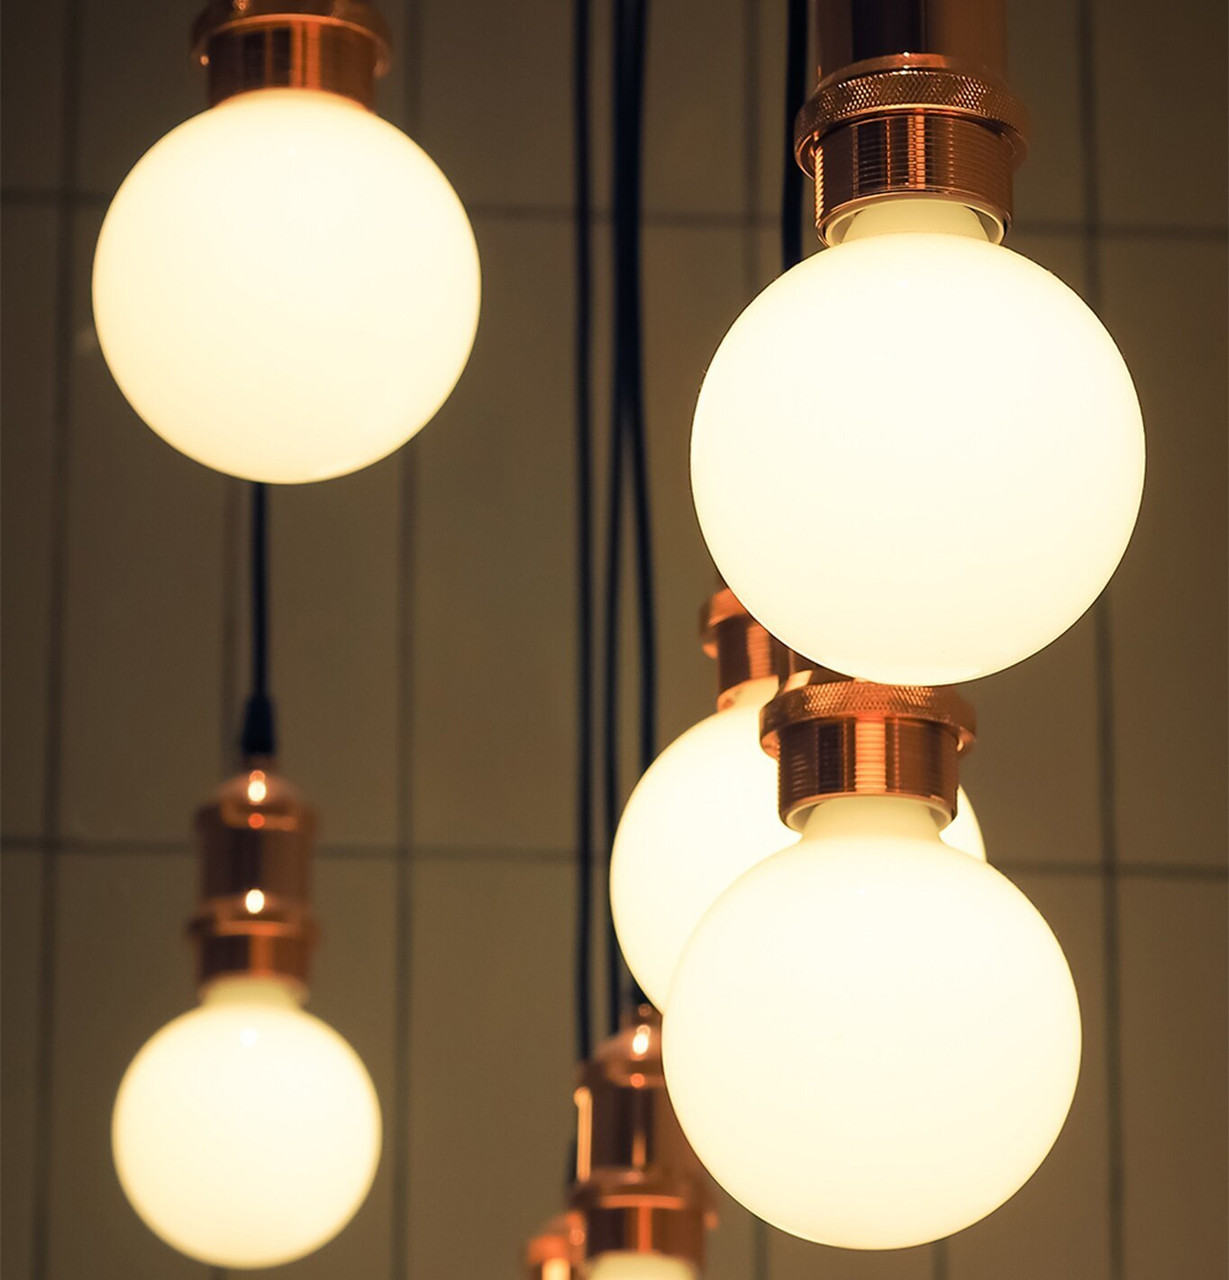 LED Globe Large Light Bulbs